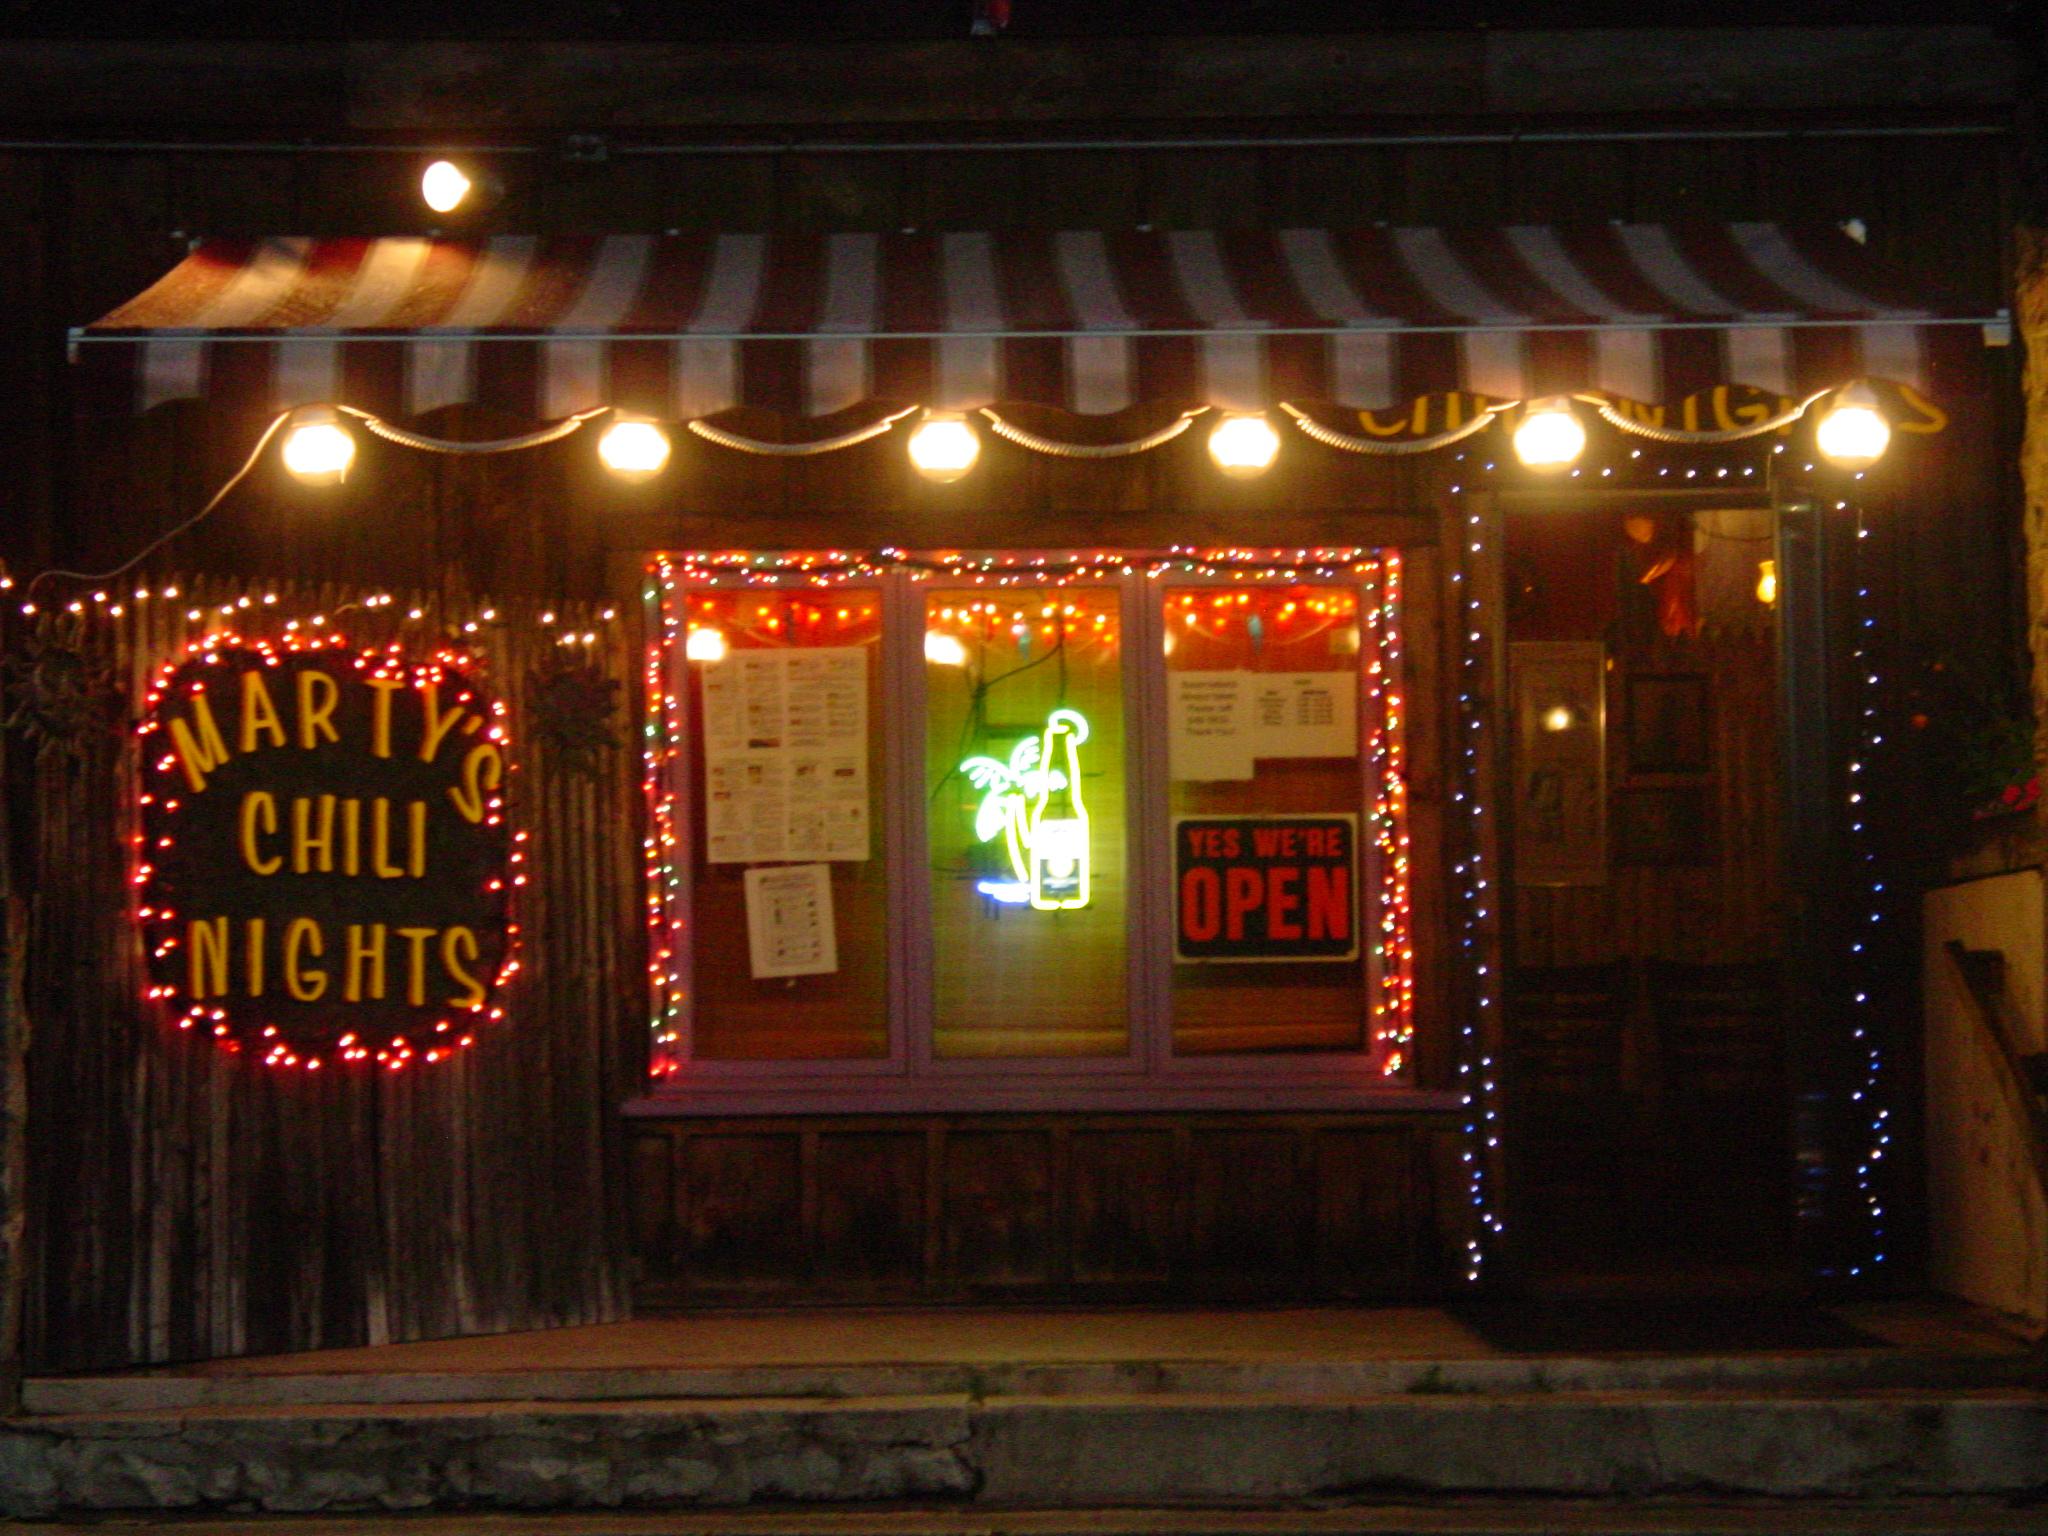 Marty's Chili Nights